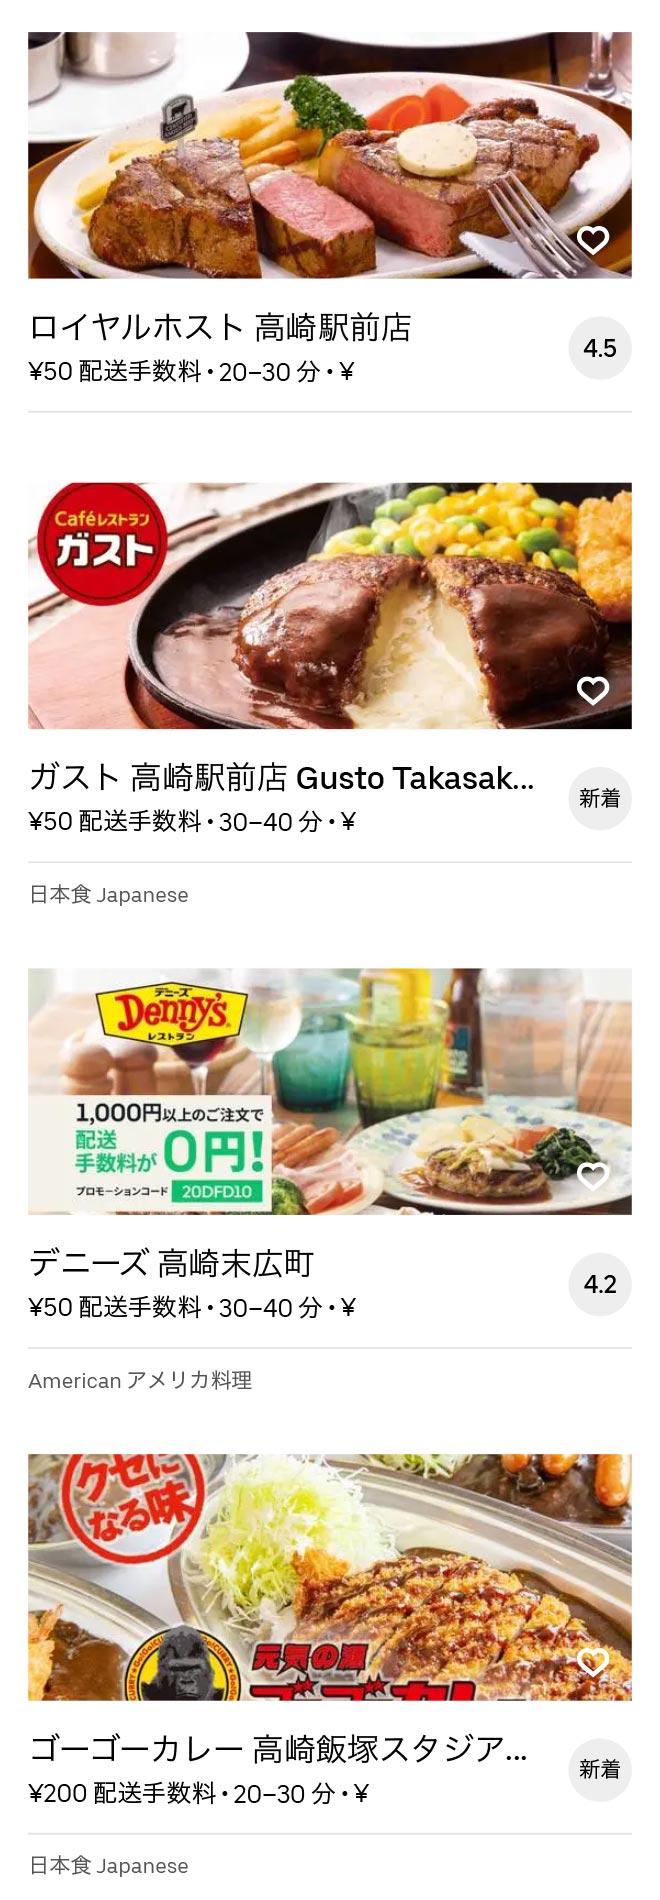 Takasaki menu 2010 09